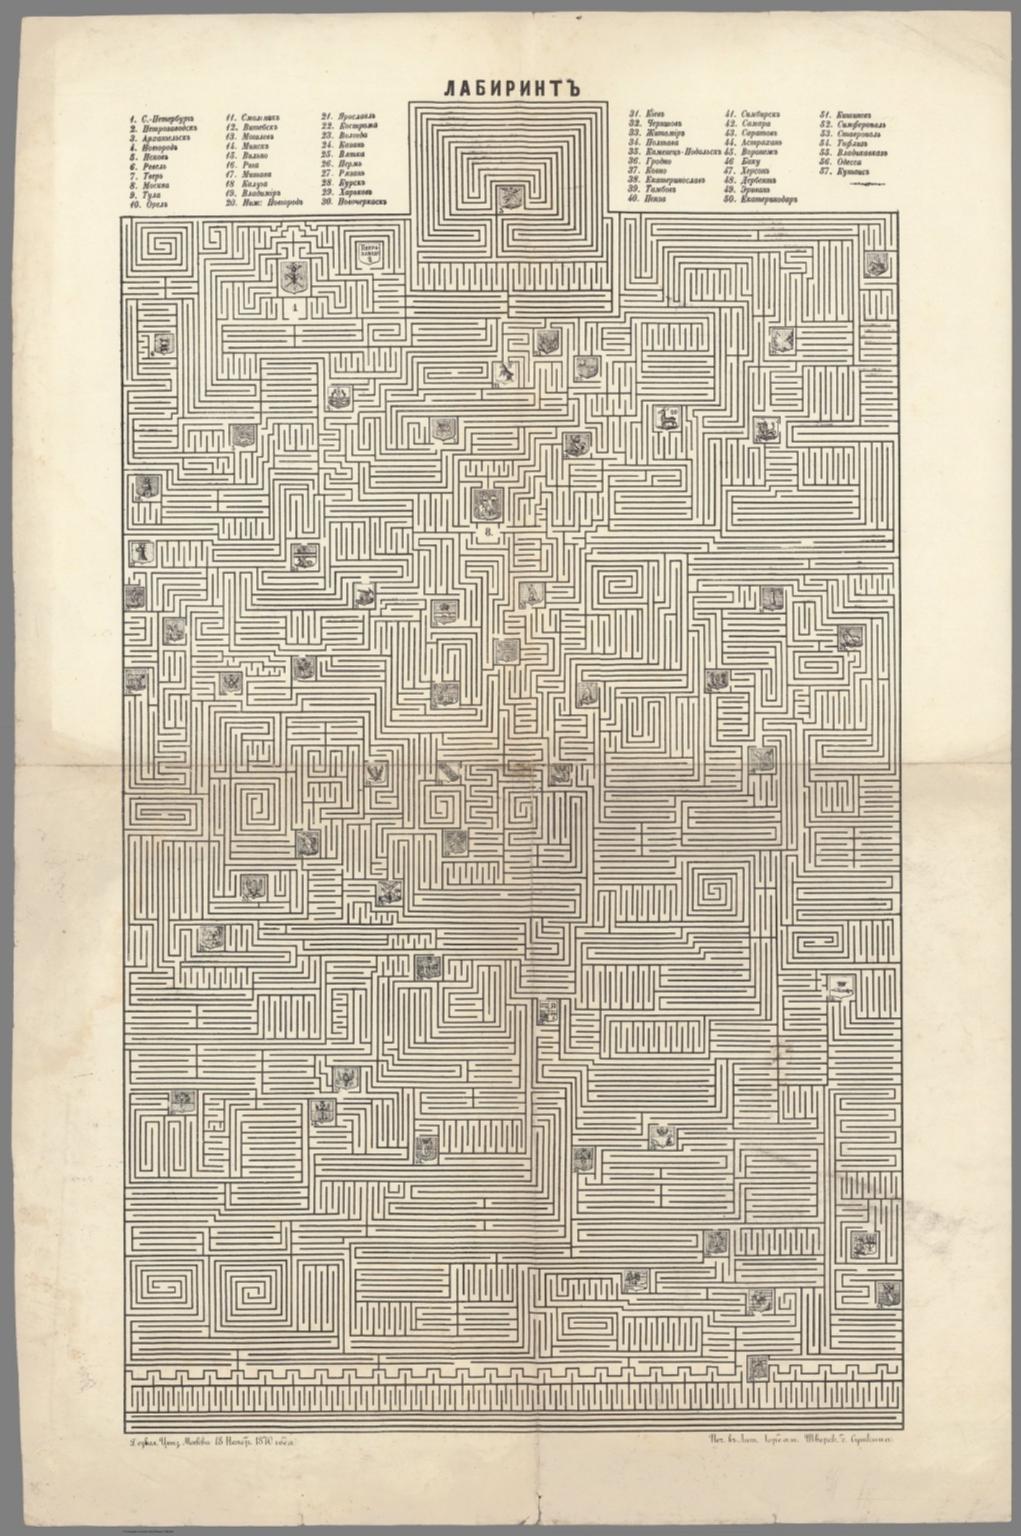 Labirint. Geograficheskaya igra (The Maze. Geographical game)